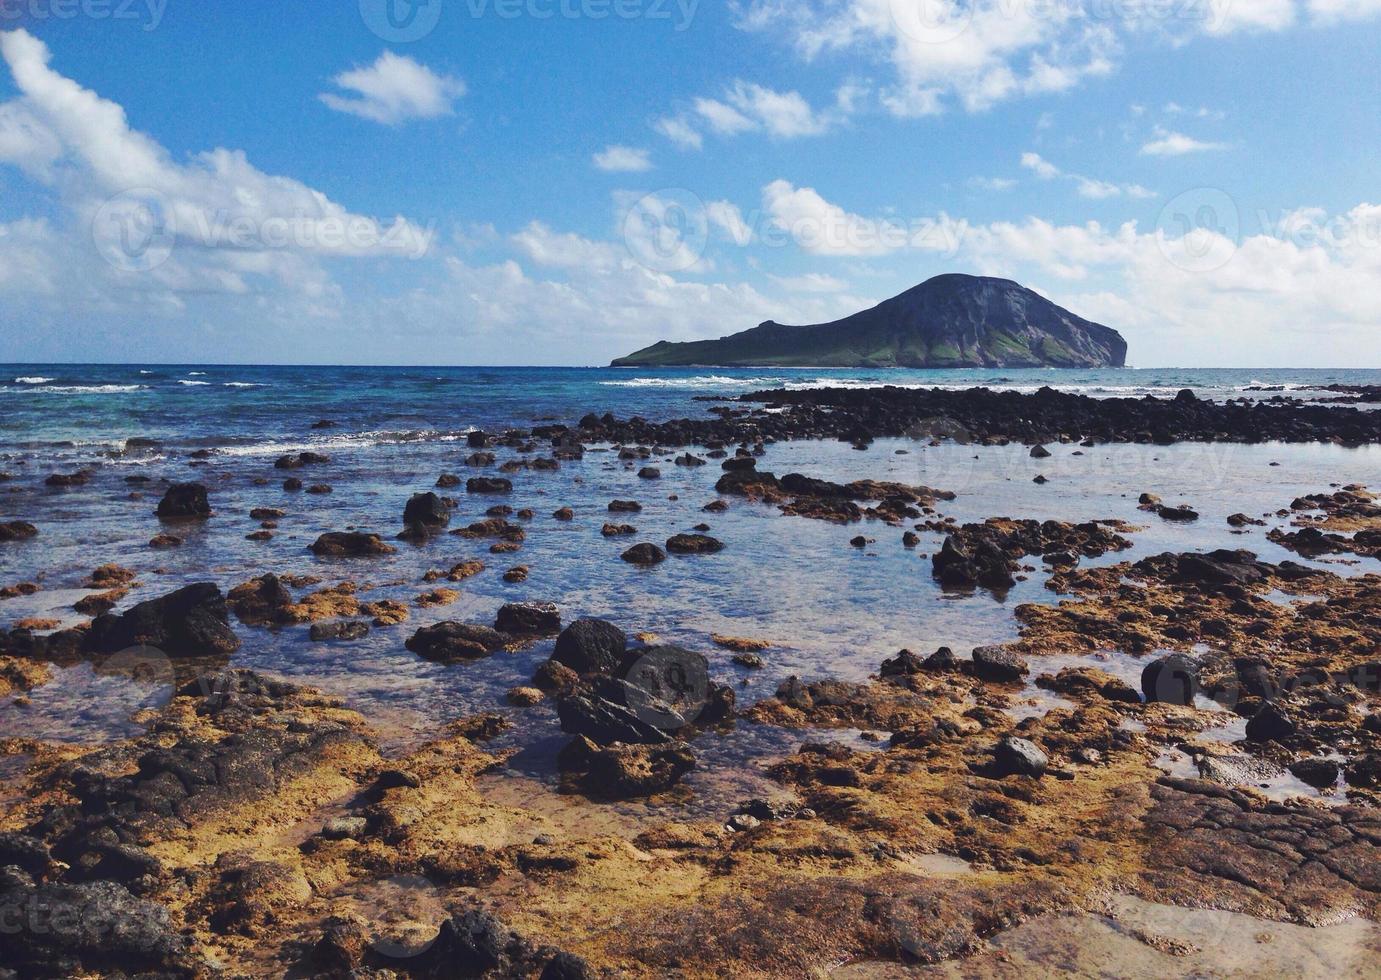 praia rochosa com ilha oceano e coelho waimanalo Havaí foto